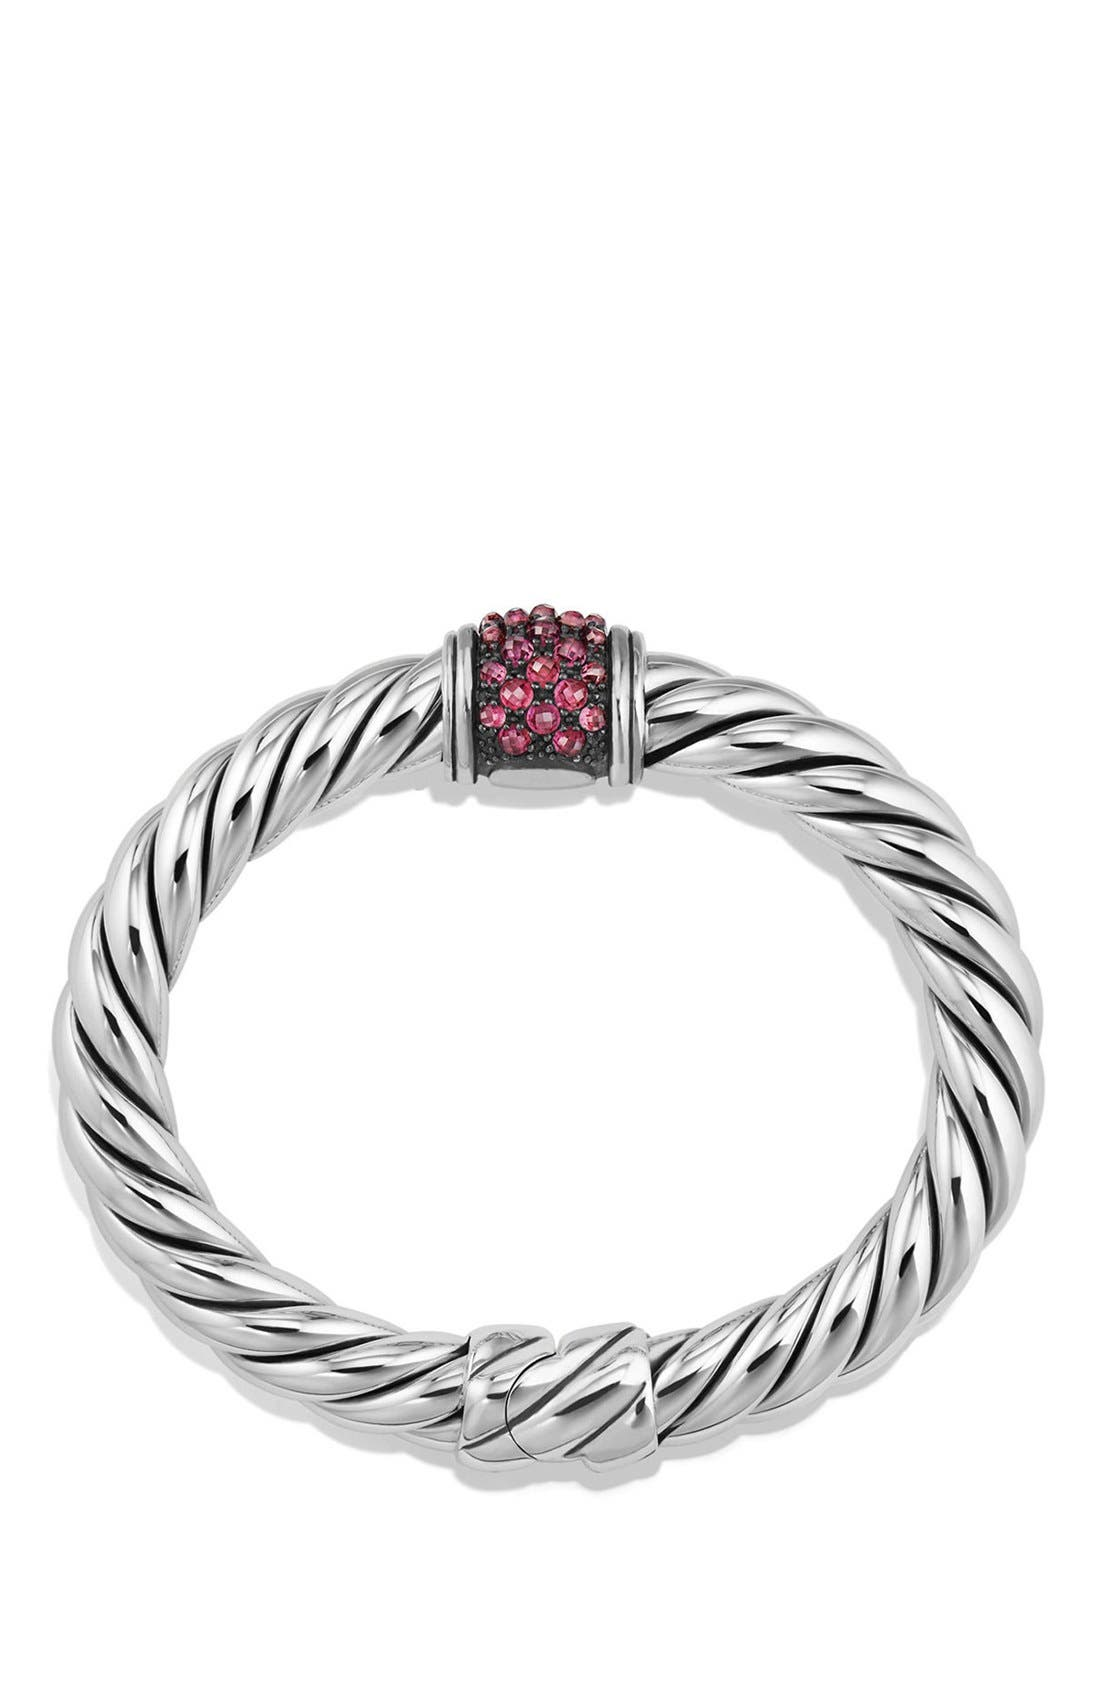 Cable Berries Hinge Bracelet,                             Alternate thumbnail 2, color,                             SILVER